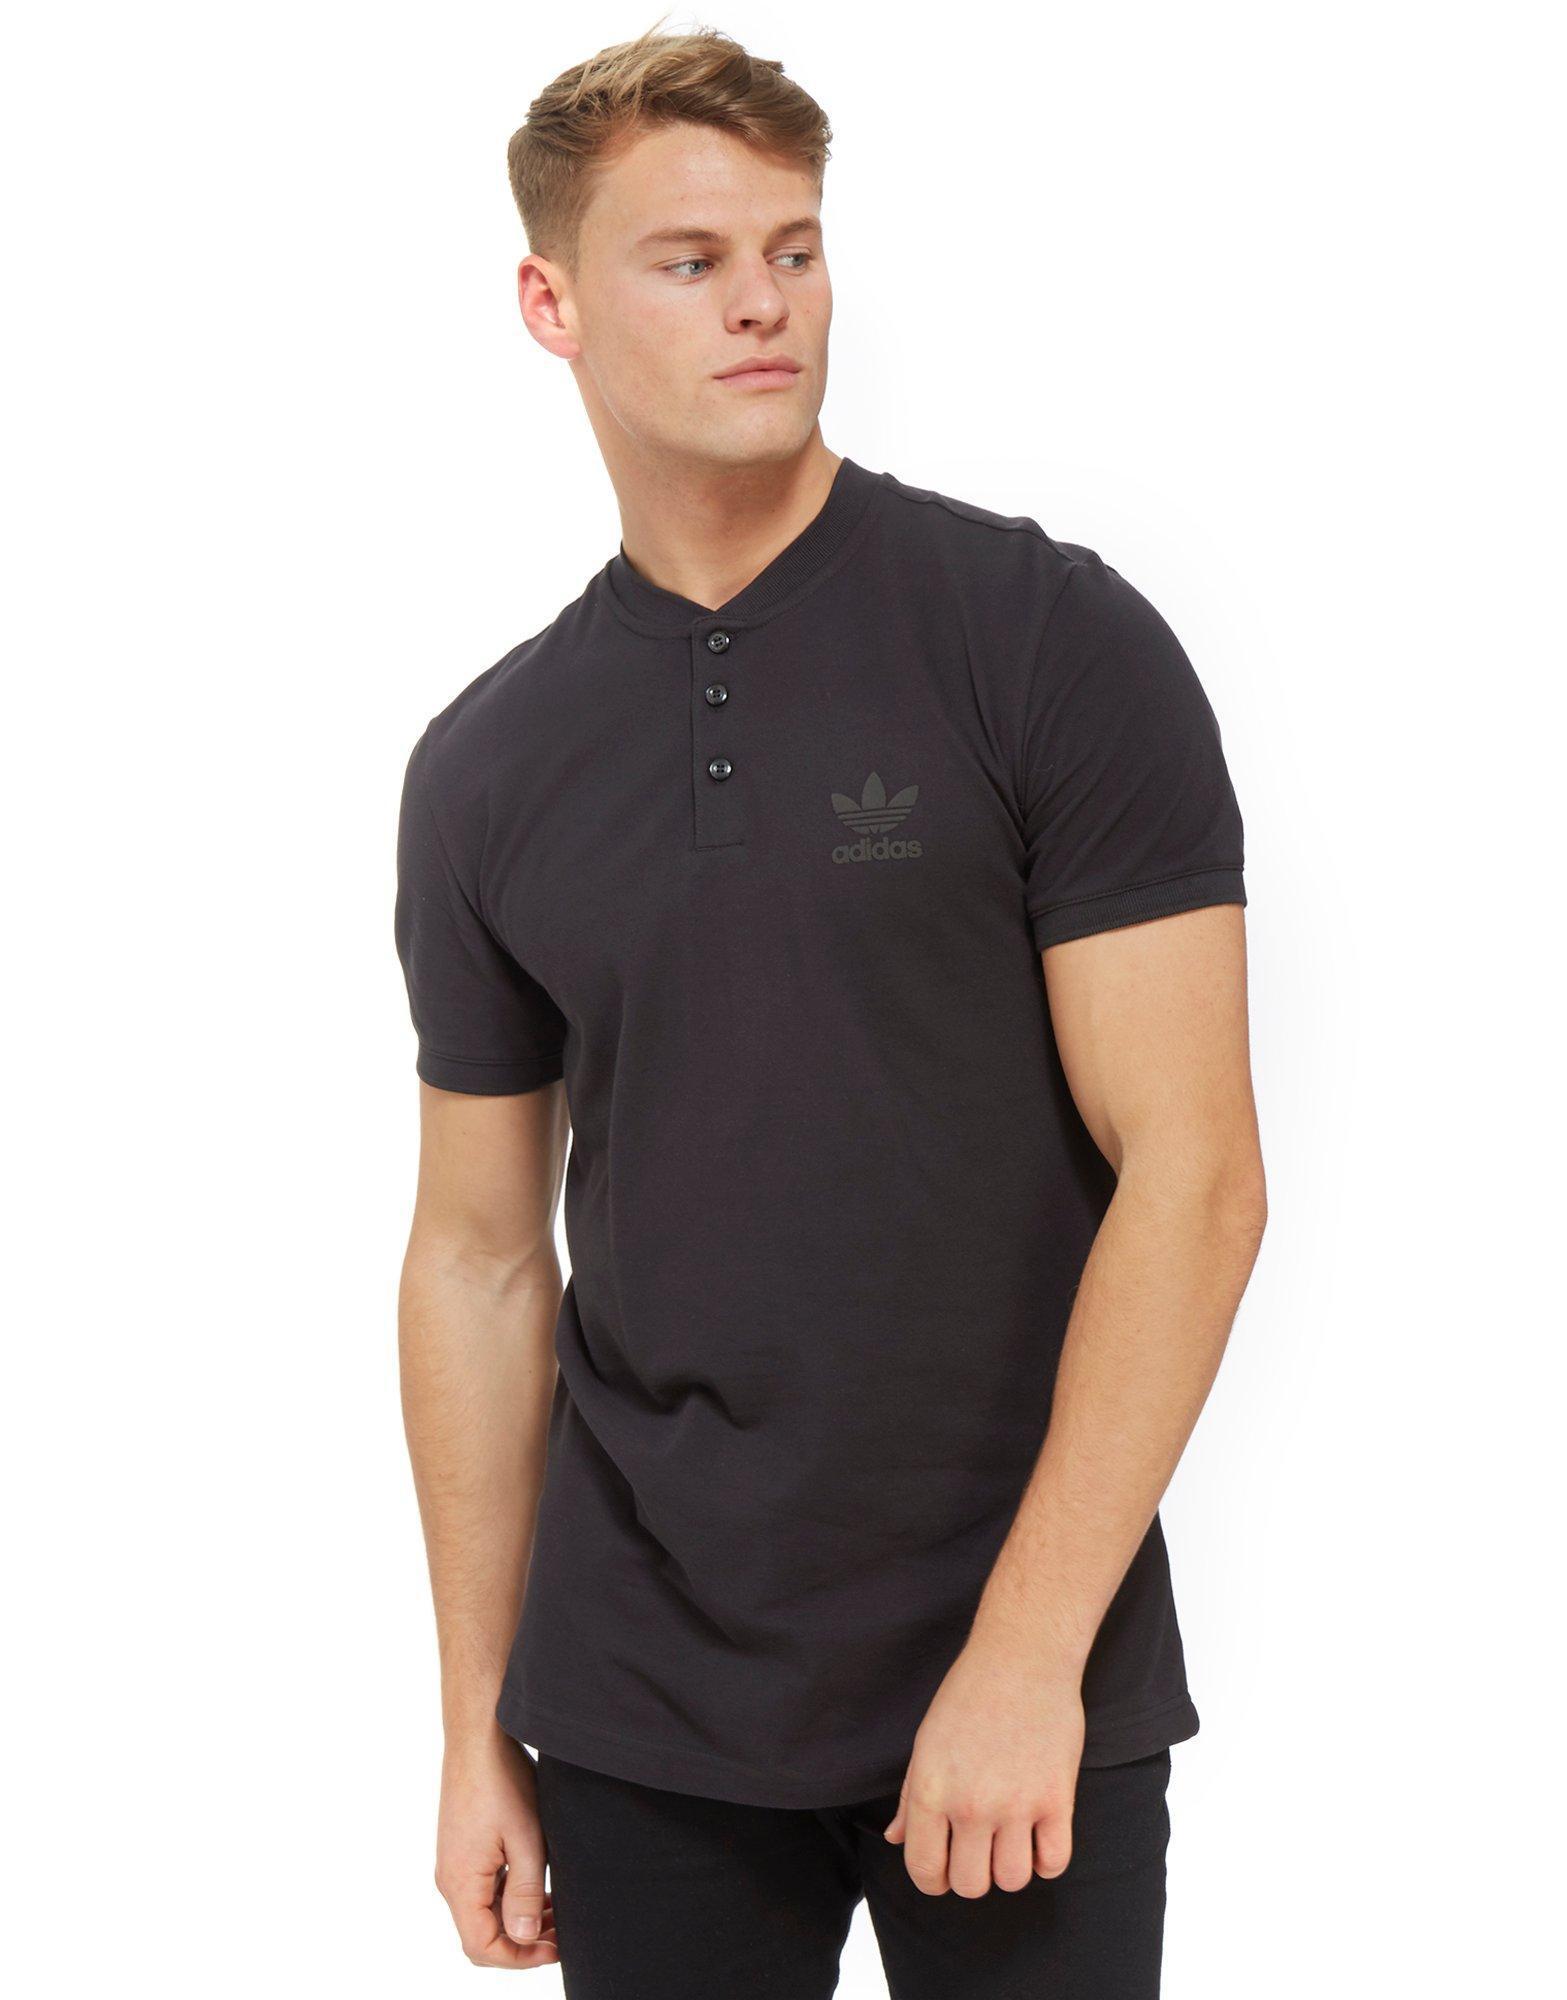 adidas Originals Cotton Winter Polo Shirt in Black for Men - Lyst